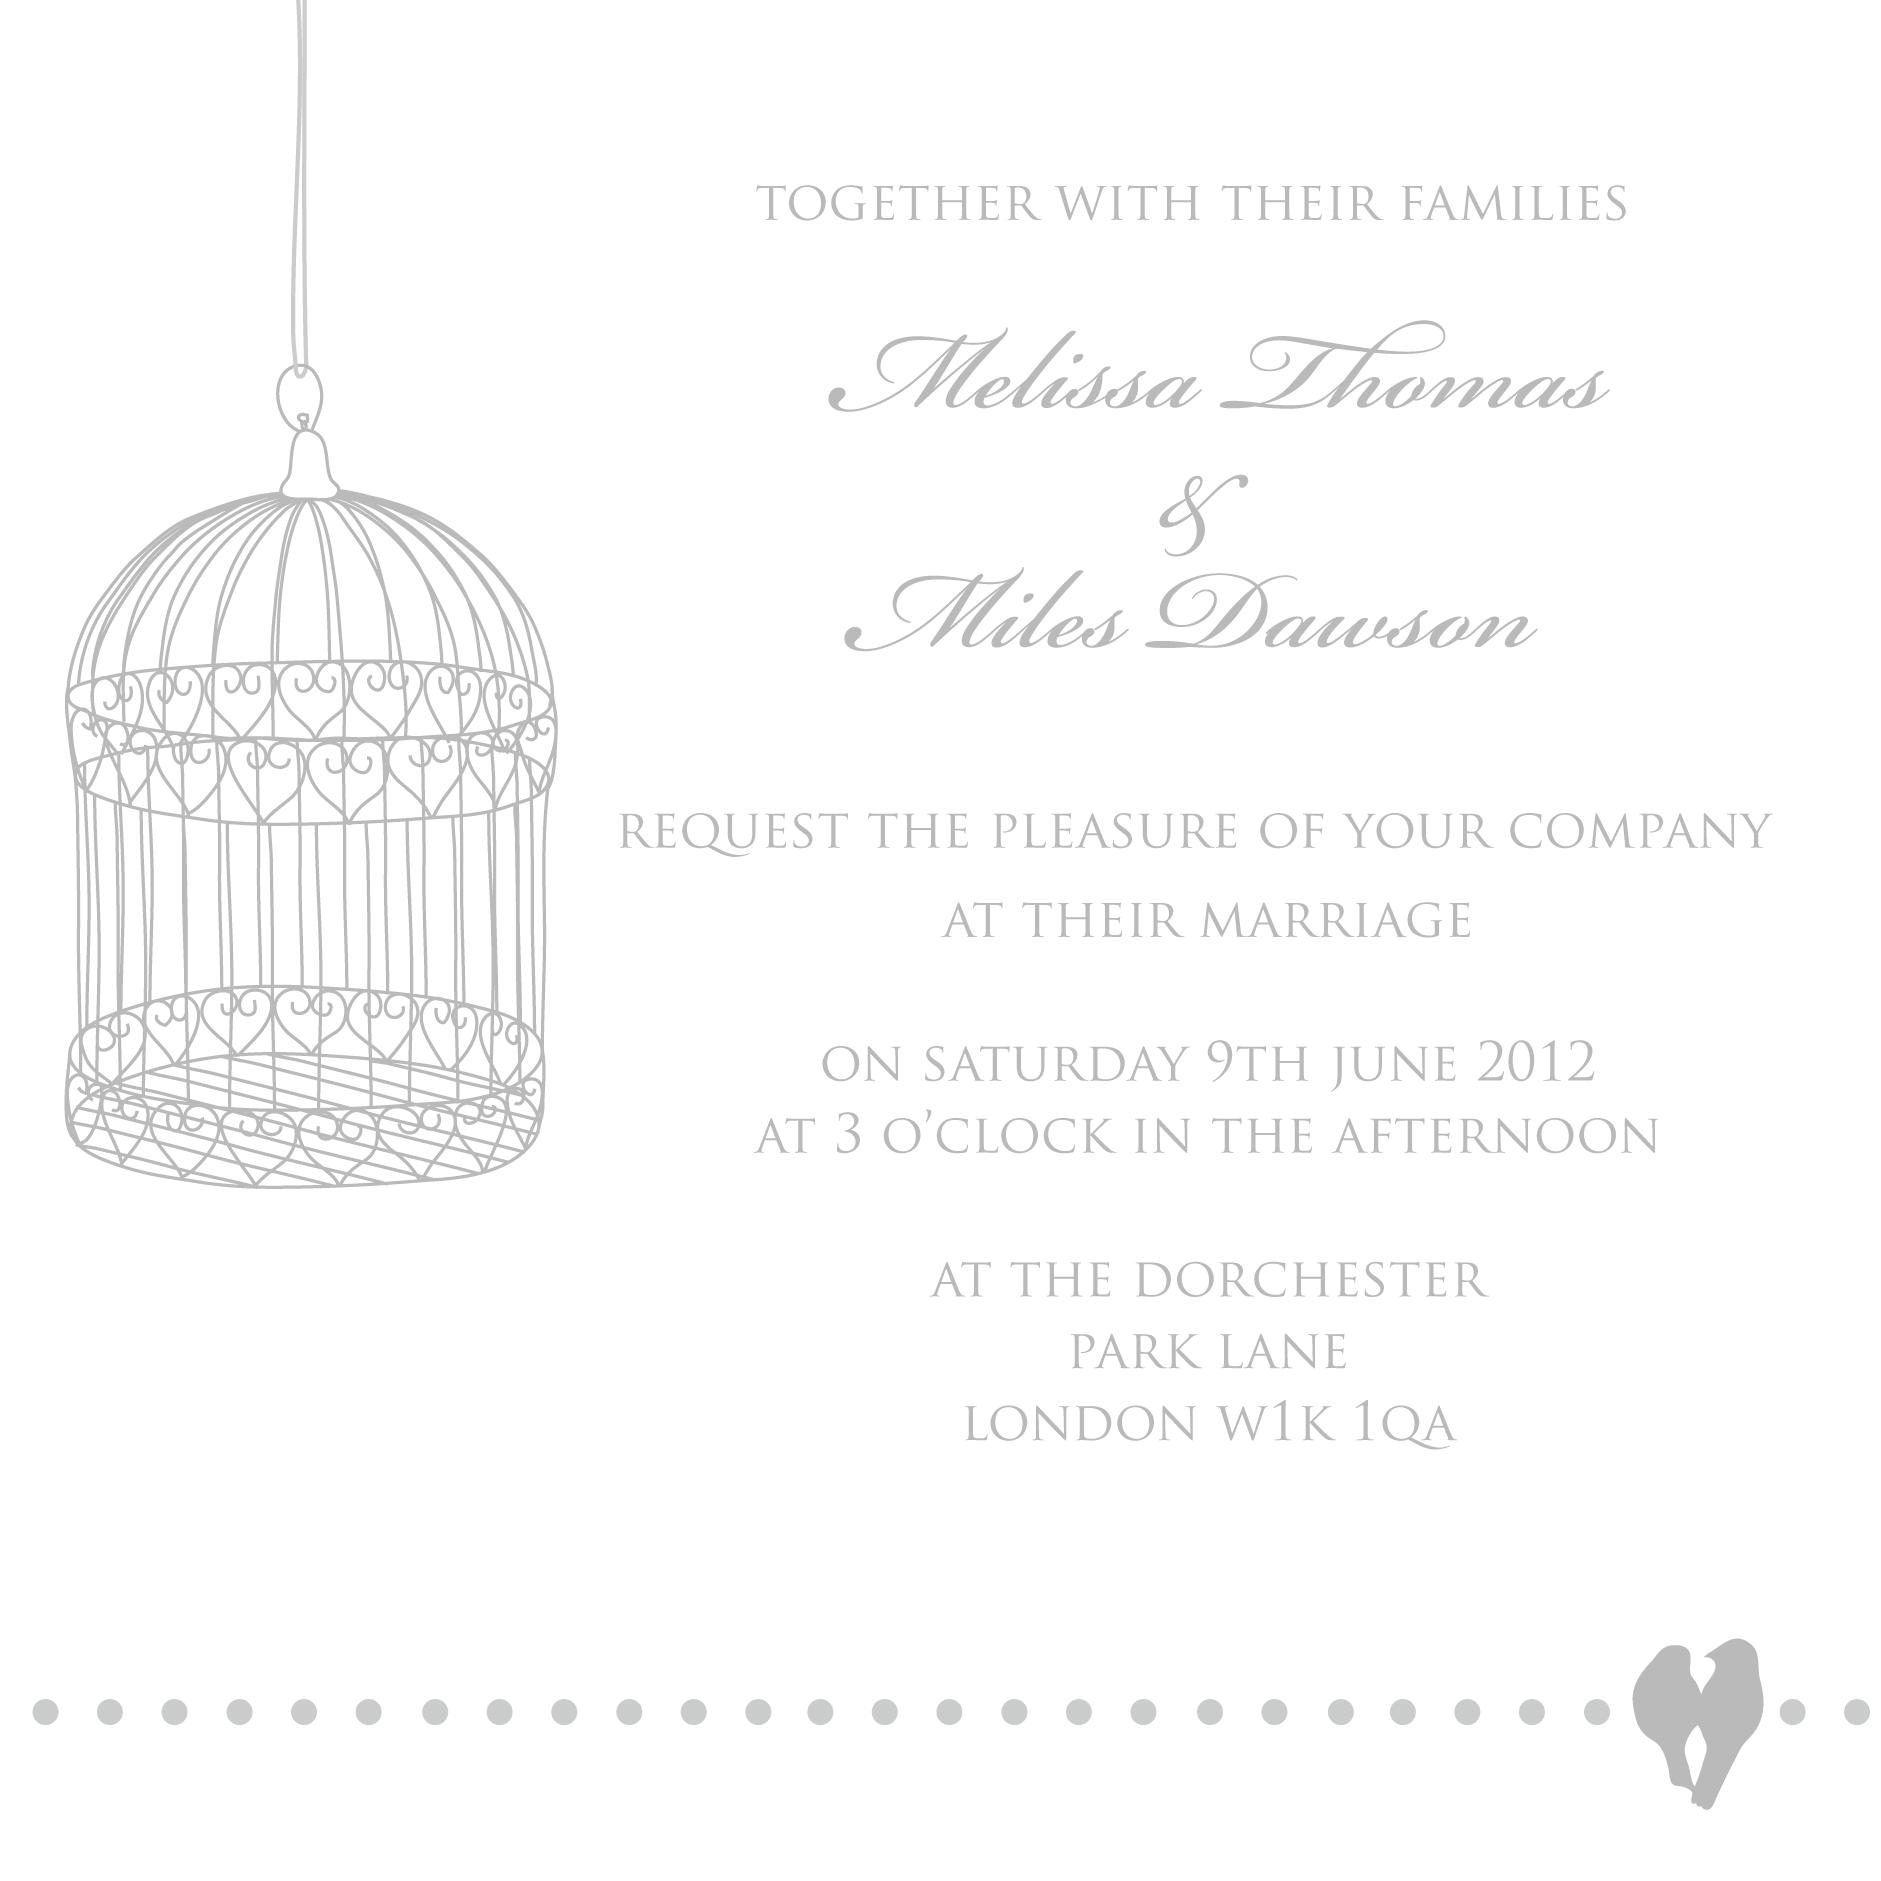 Wedding Invitations In Elegant Shades of Grey | Ananya Blog